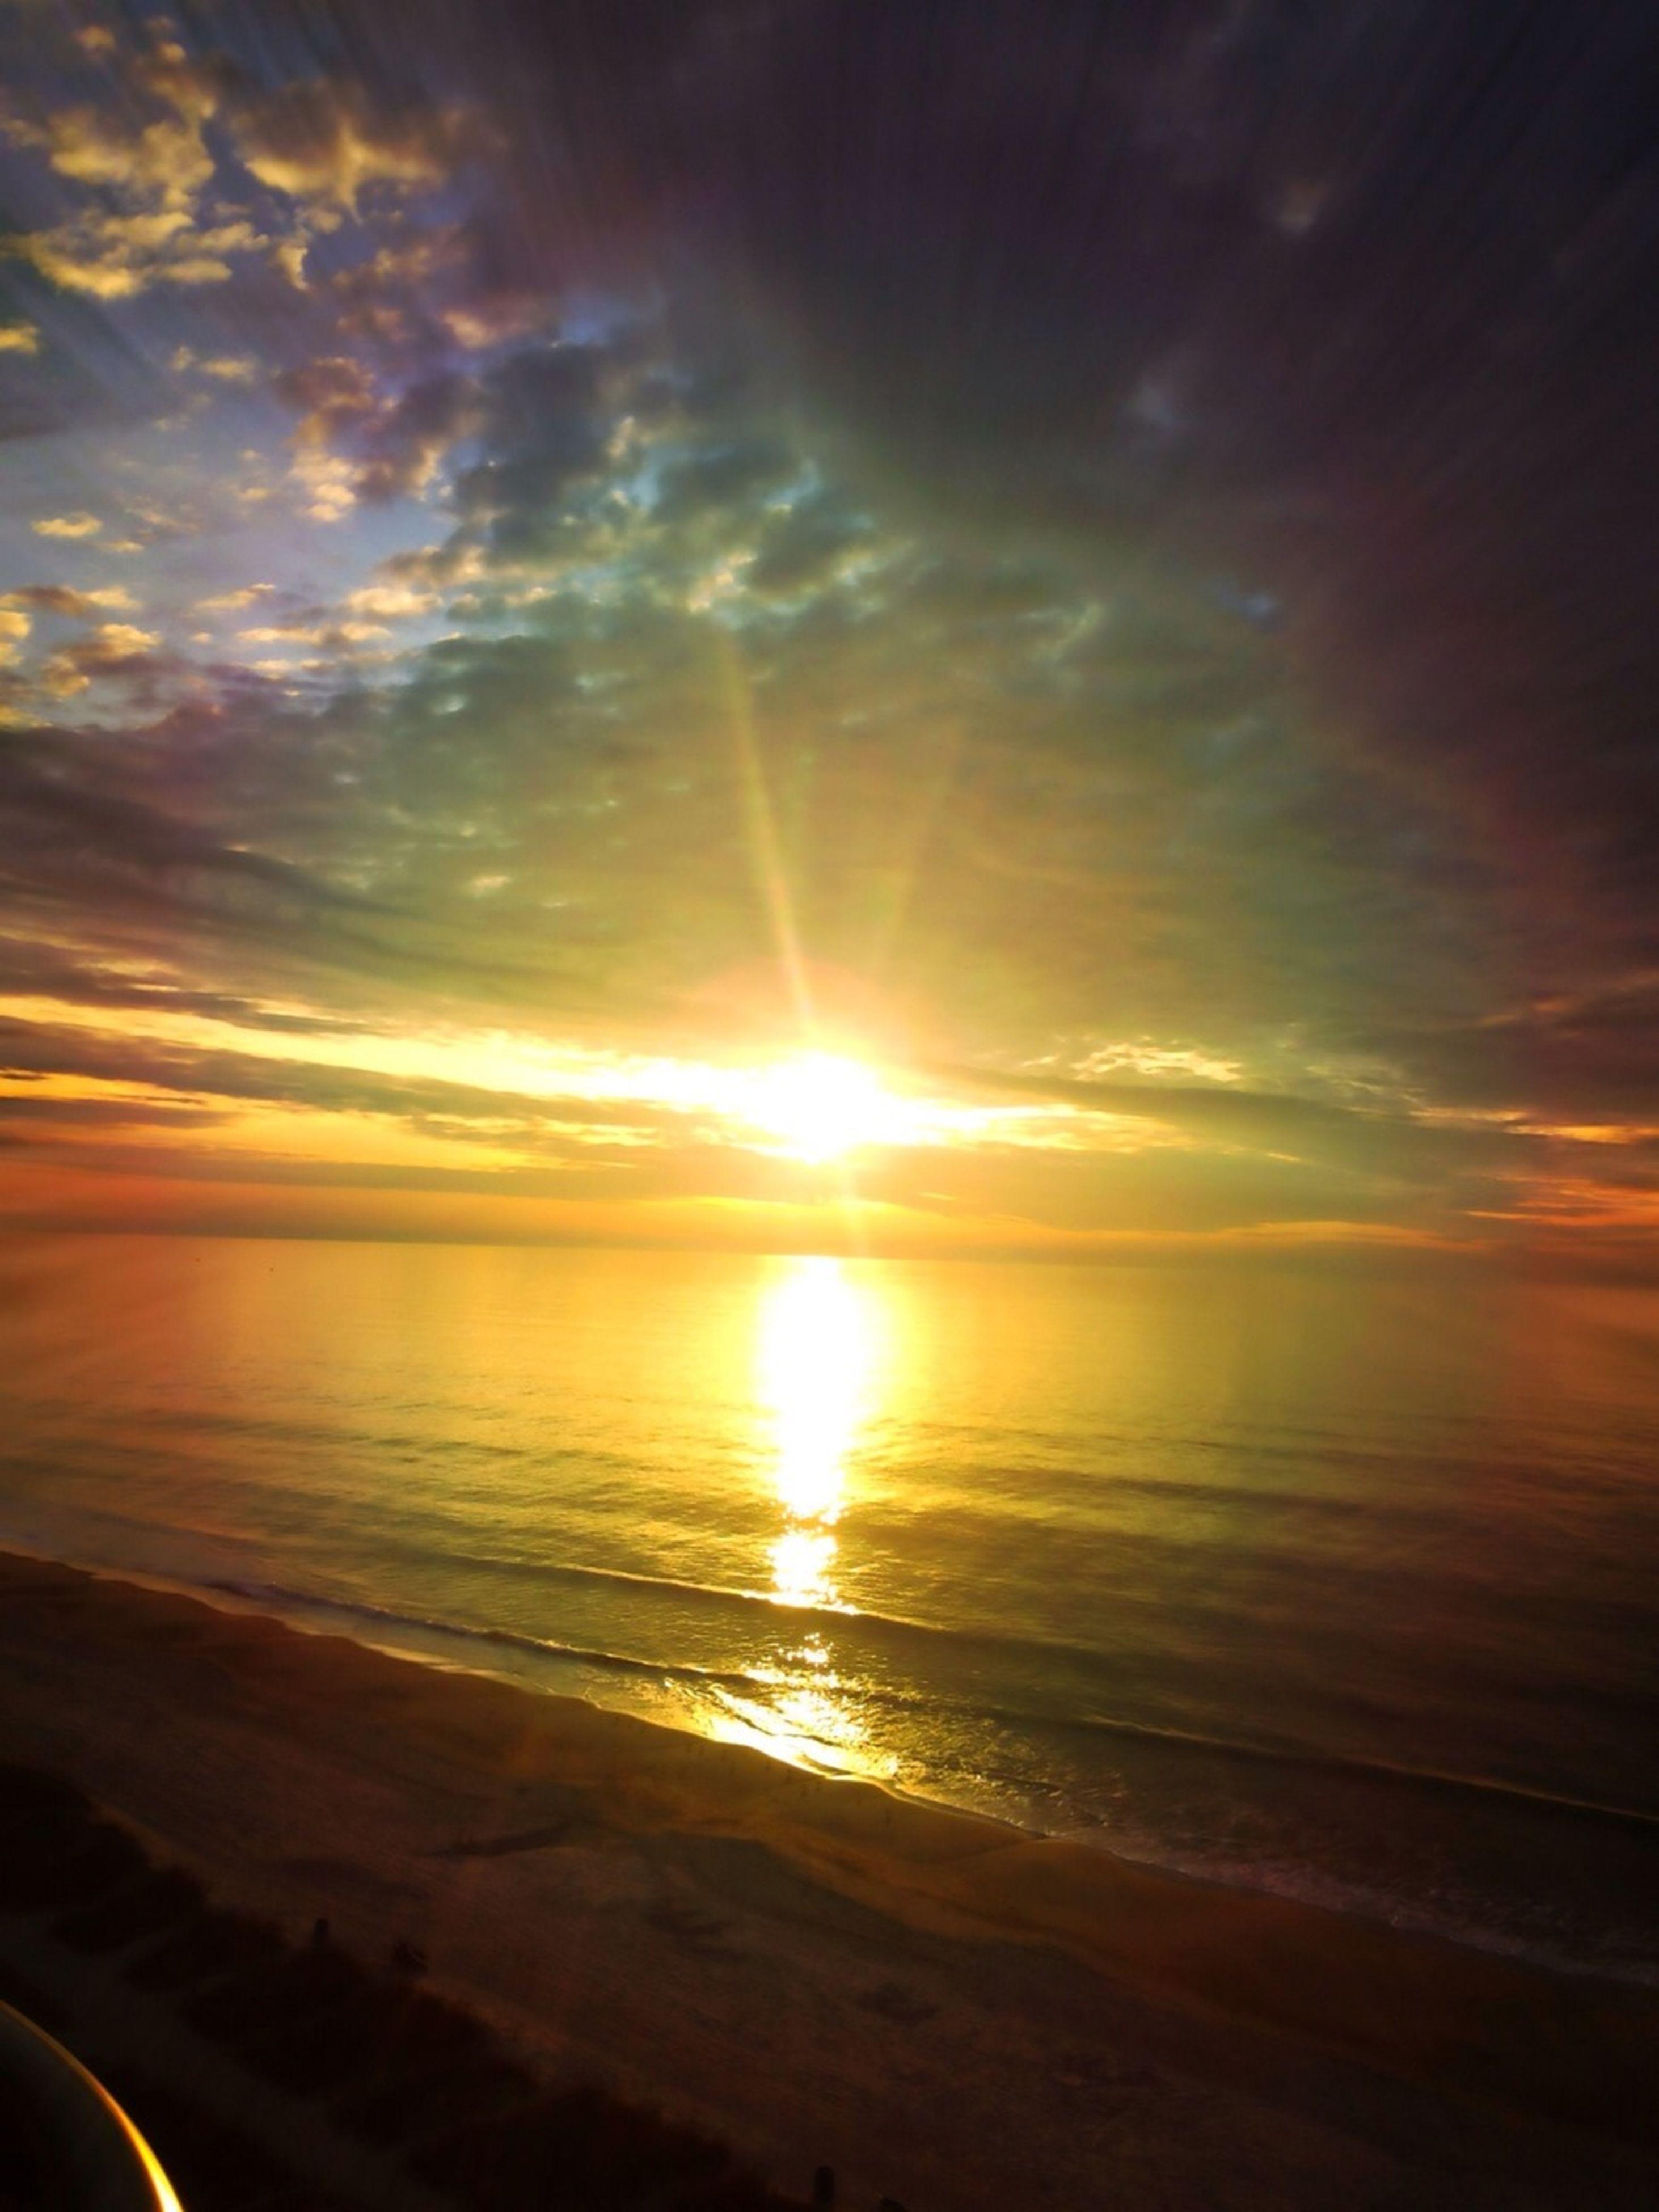 sunset, sea, horizon over water, sun, beach, water, scenics, beauty in nature, tranquil scene, sky, shore, tranquility, reflection, idyllic, orange color, nature, sunlight, cloud - sky, sunbeam, sand